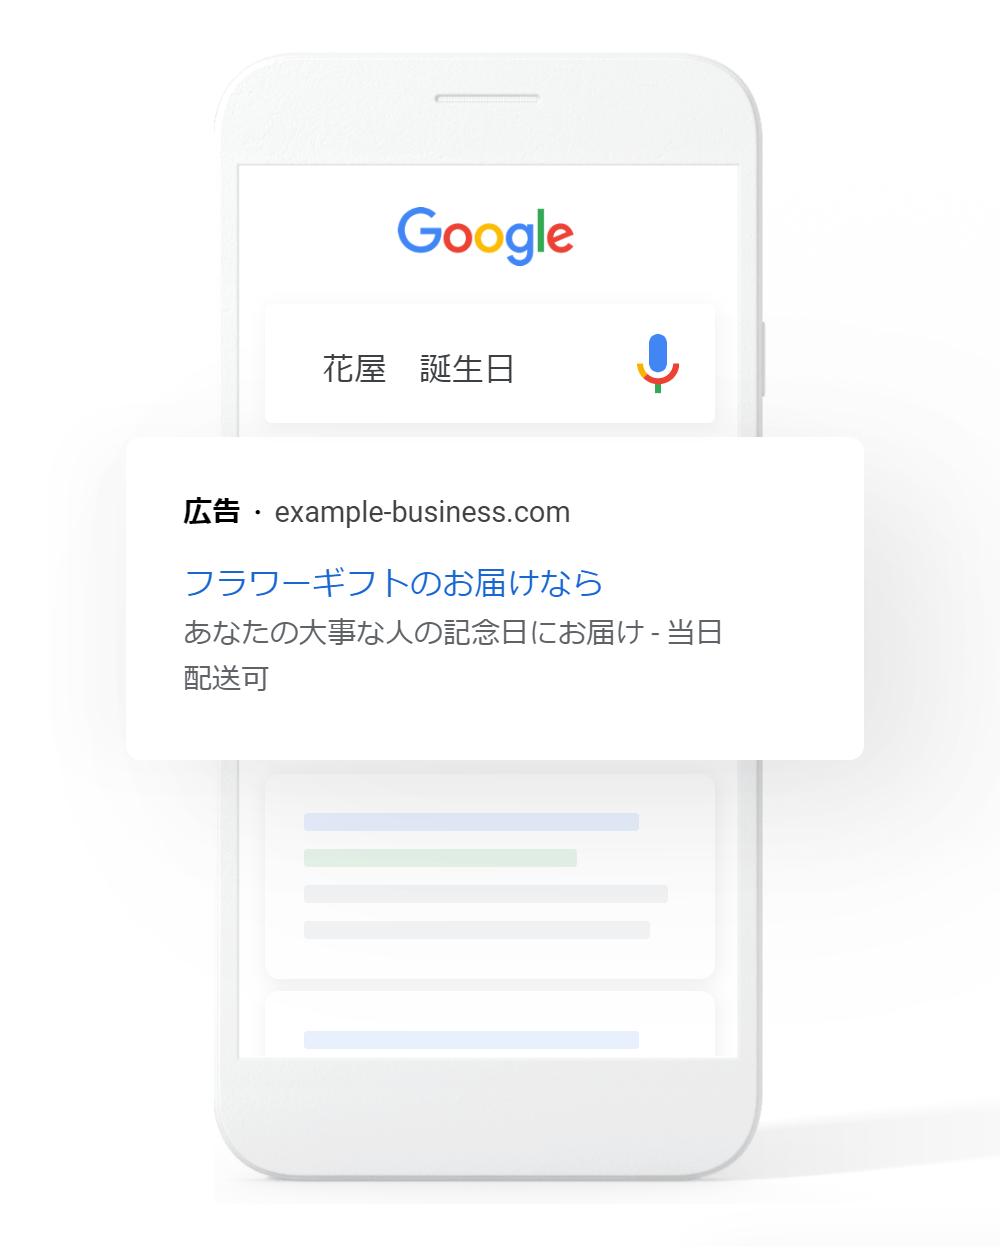 Google Ads - Search Ads